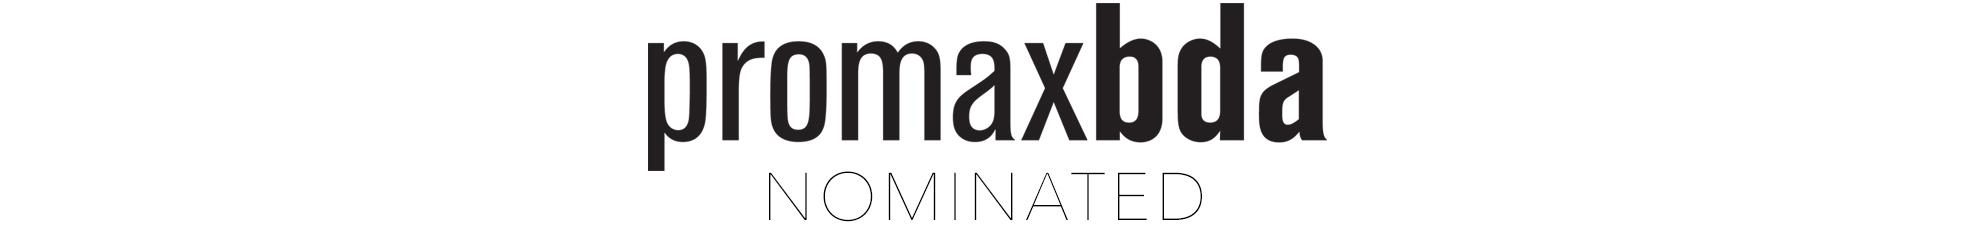 Promax Nominated2.jpg